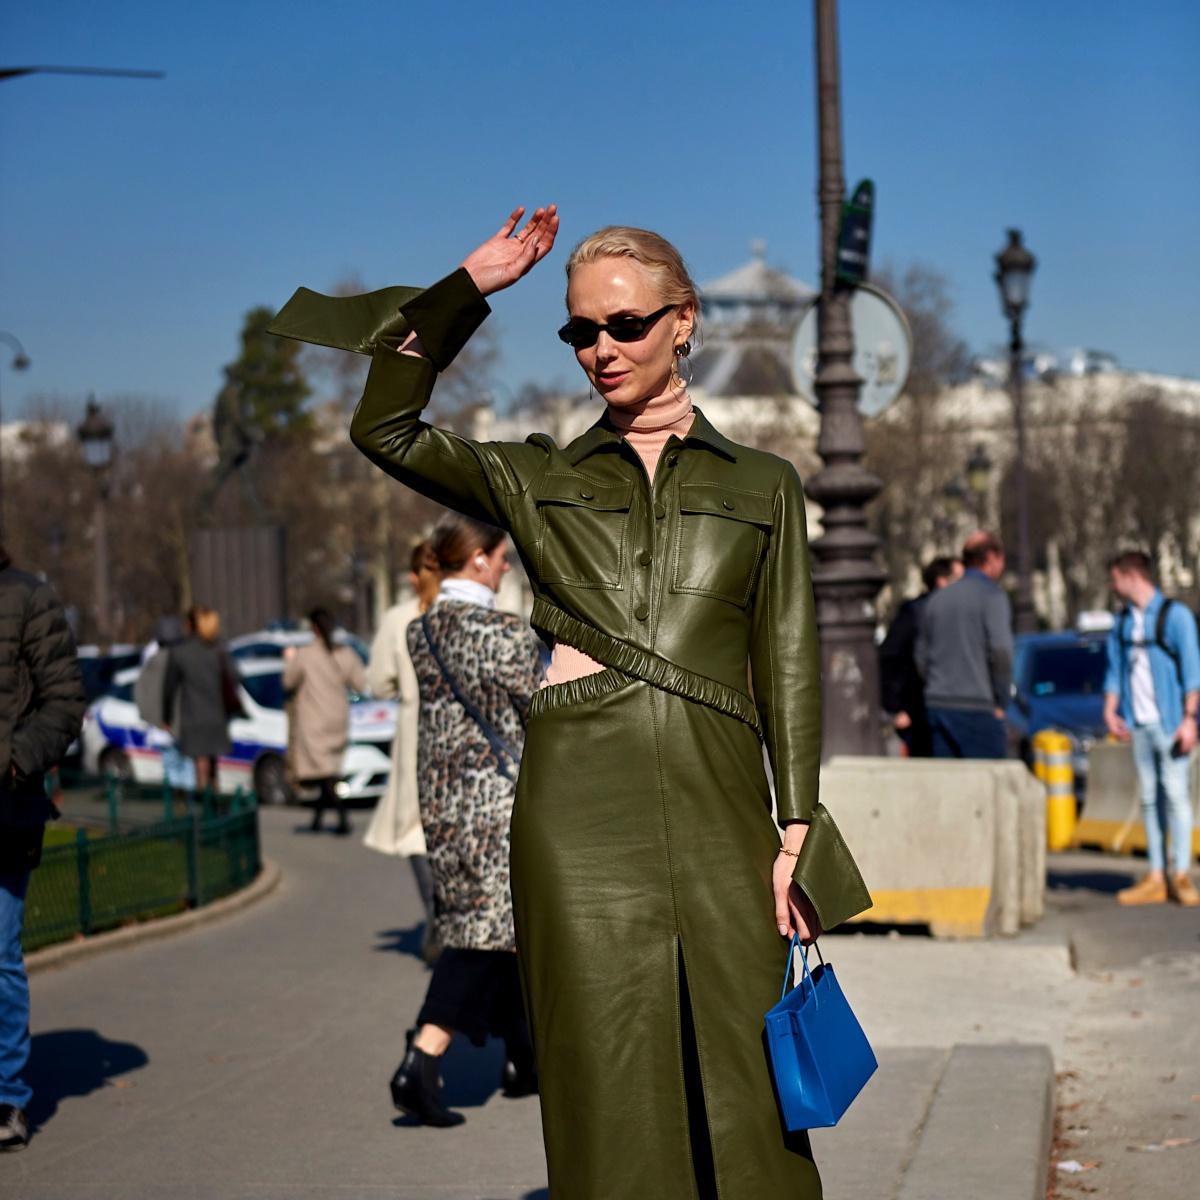 Anatomie d'un look : une tenue avec une robe en cuir